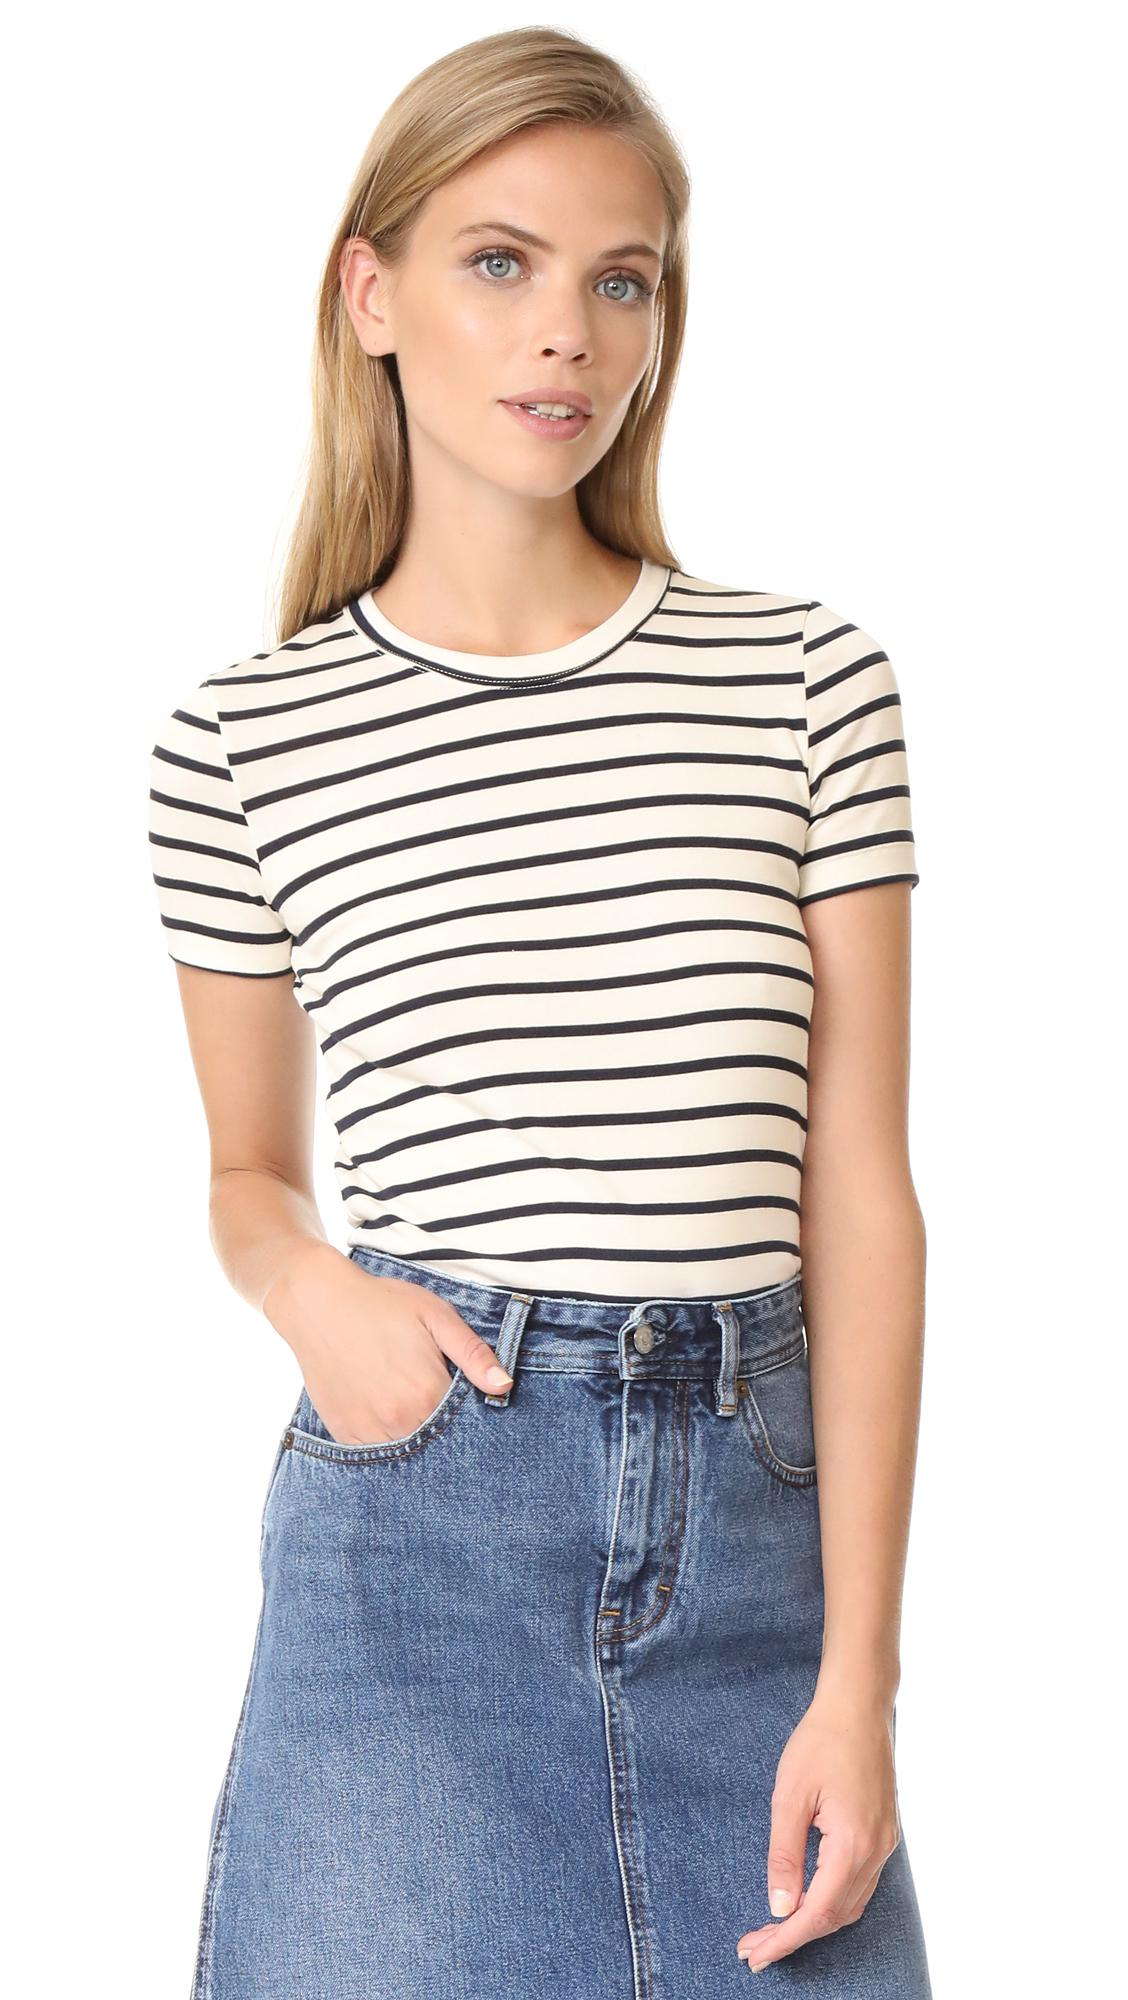 Lyst petit bateau 1x1 iconic striped tee for Petit bateau striped shirt